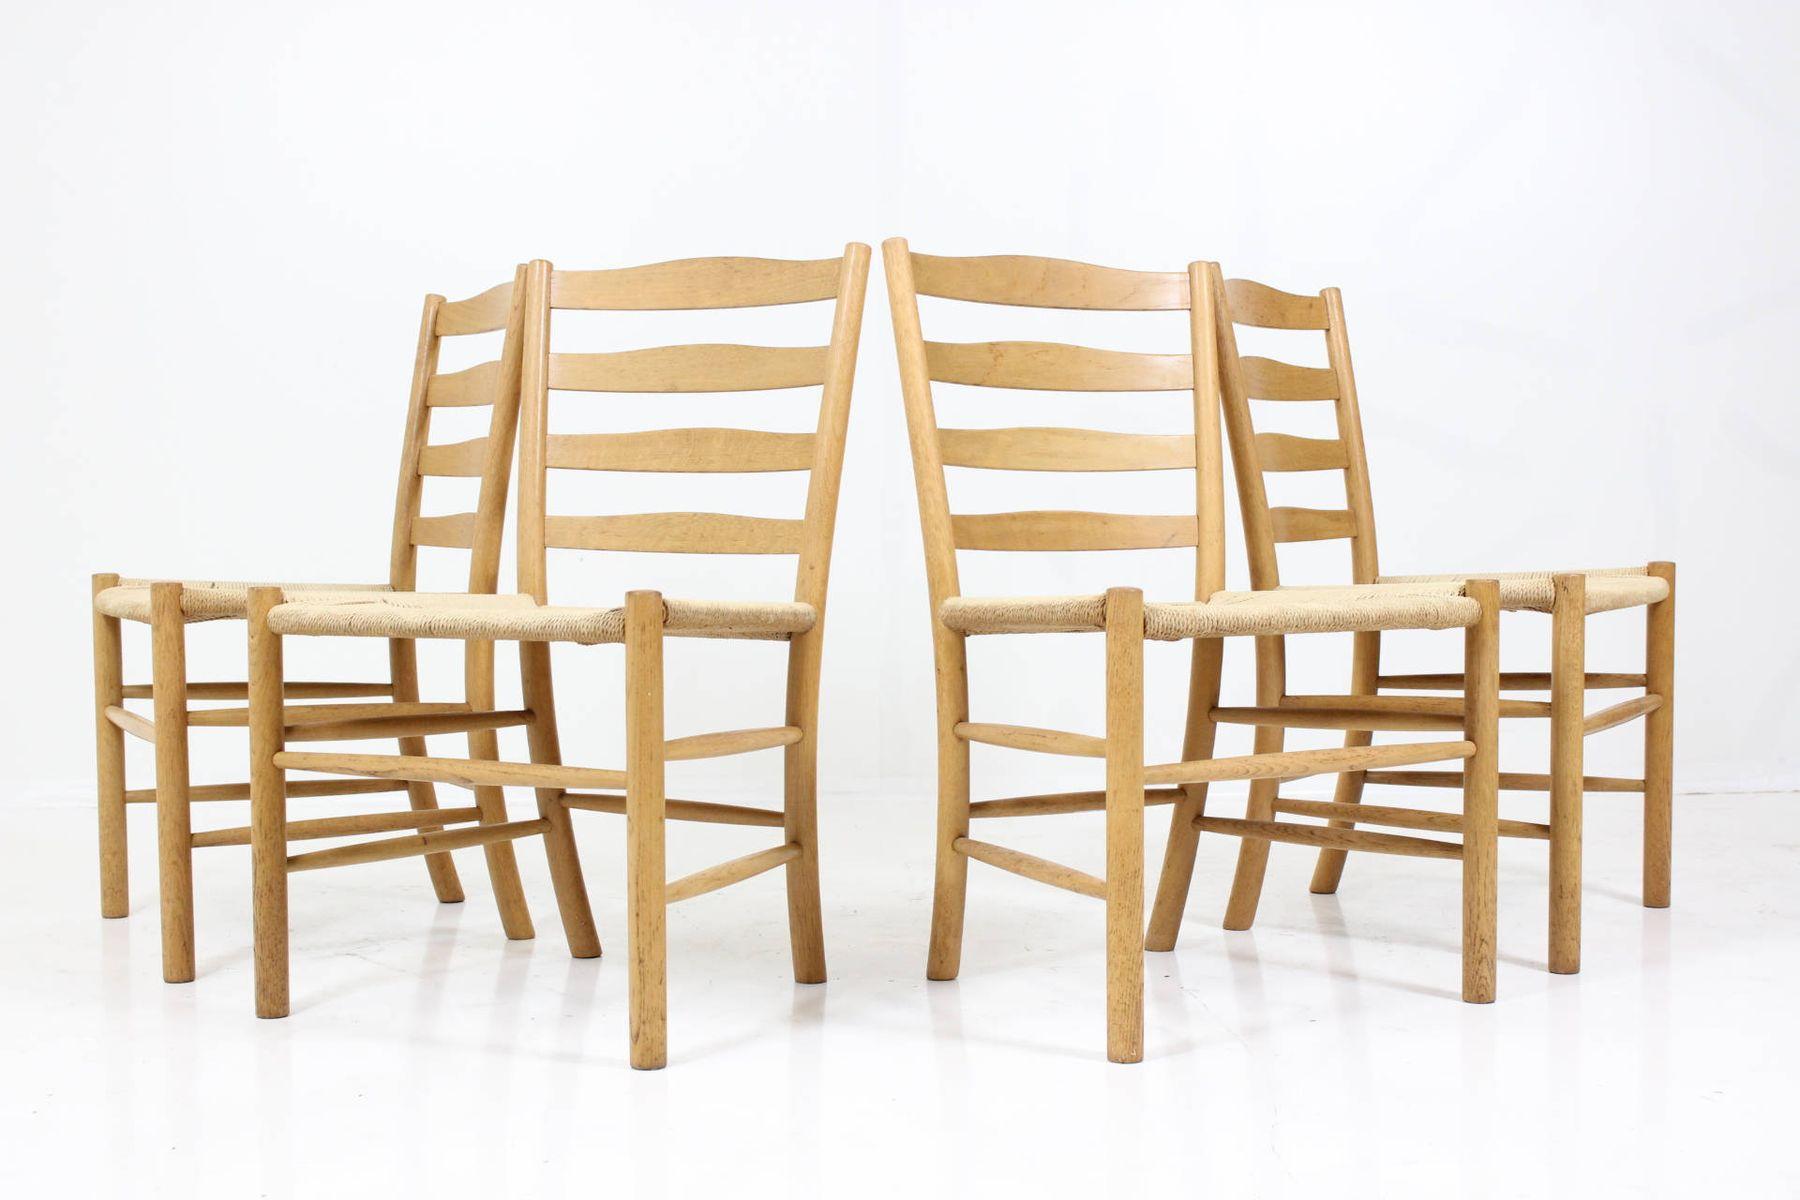 church chairs by kaare klint for fritz hansen set of 4 church chairs